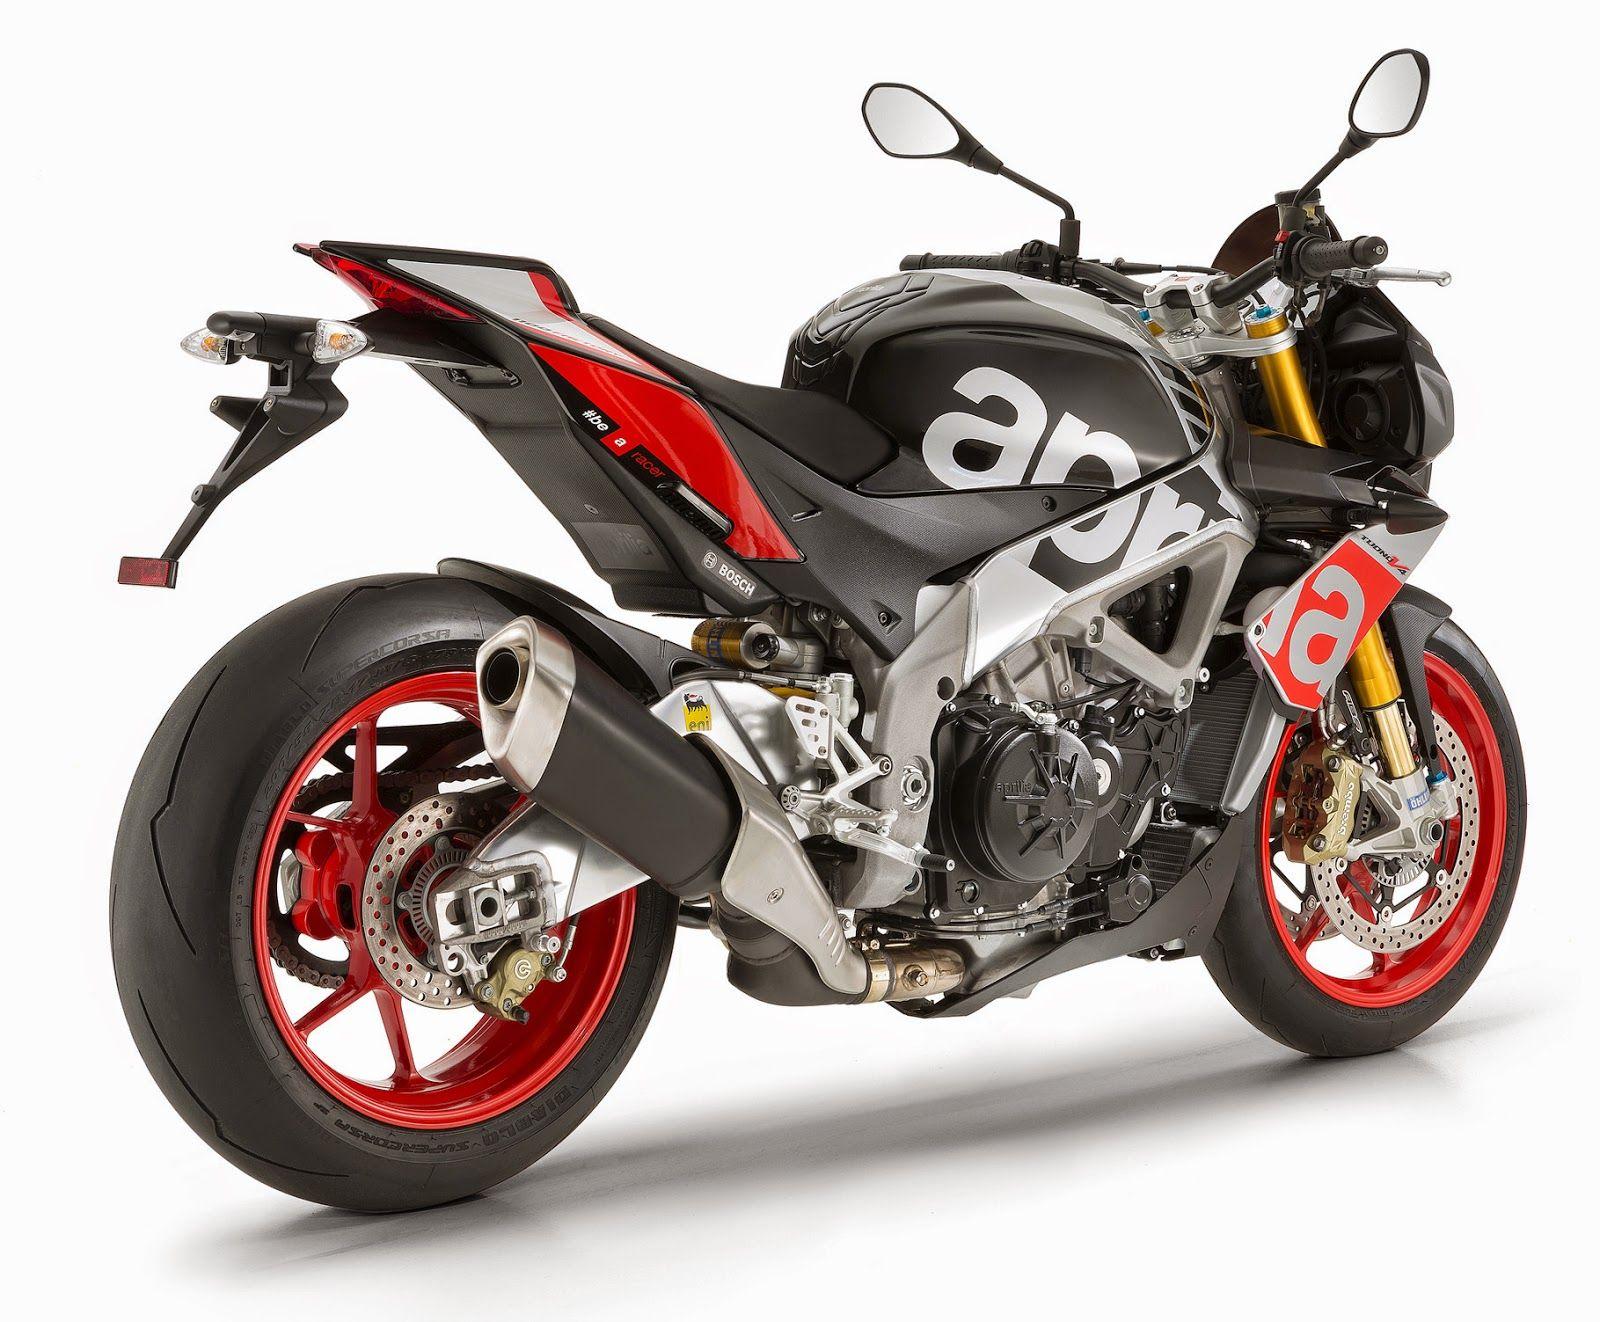 2017 Aprilia Tuono V4 1100 RR & Factory - Bike Review